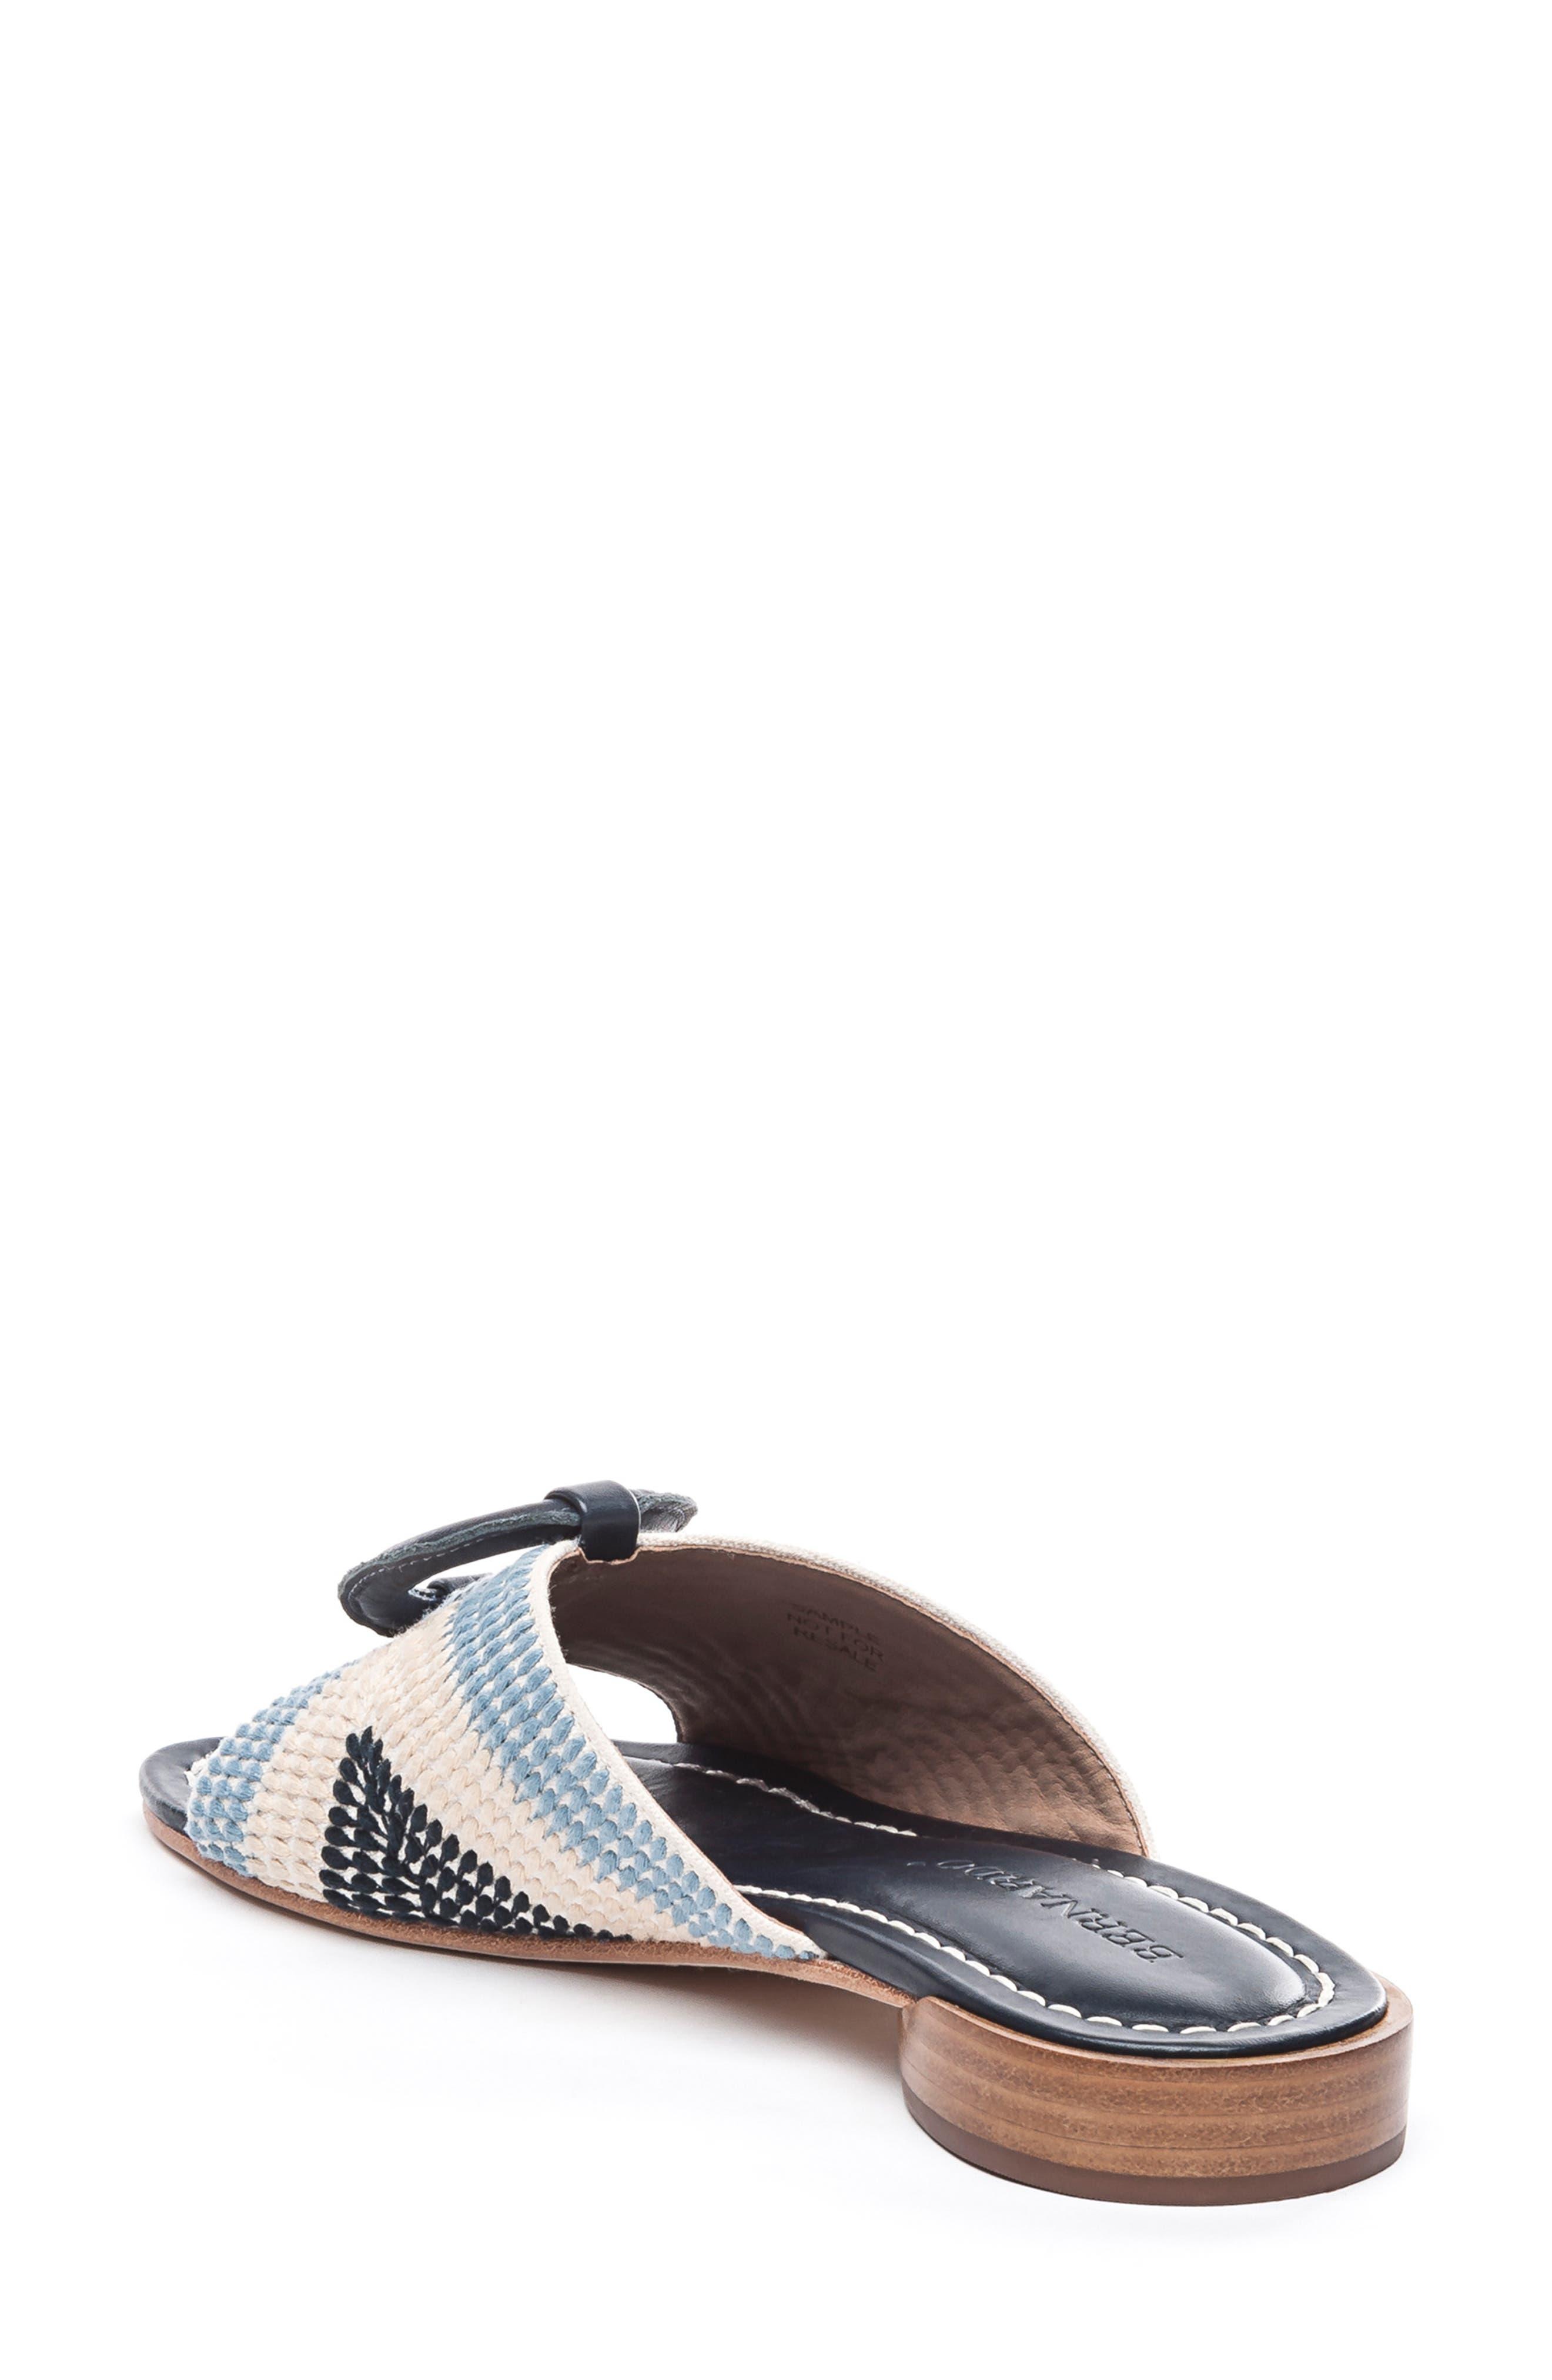 BERNARDO, Footwear Tay Slide Sandal, Alternate thumbnail 2, color, BLUE/ CREAM LEATHER